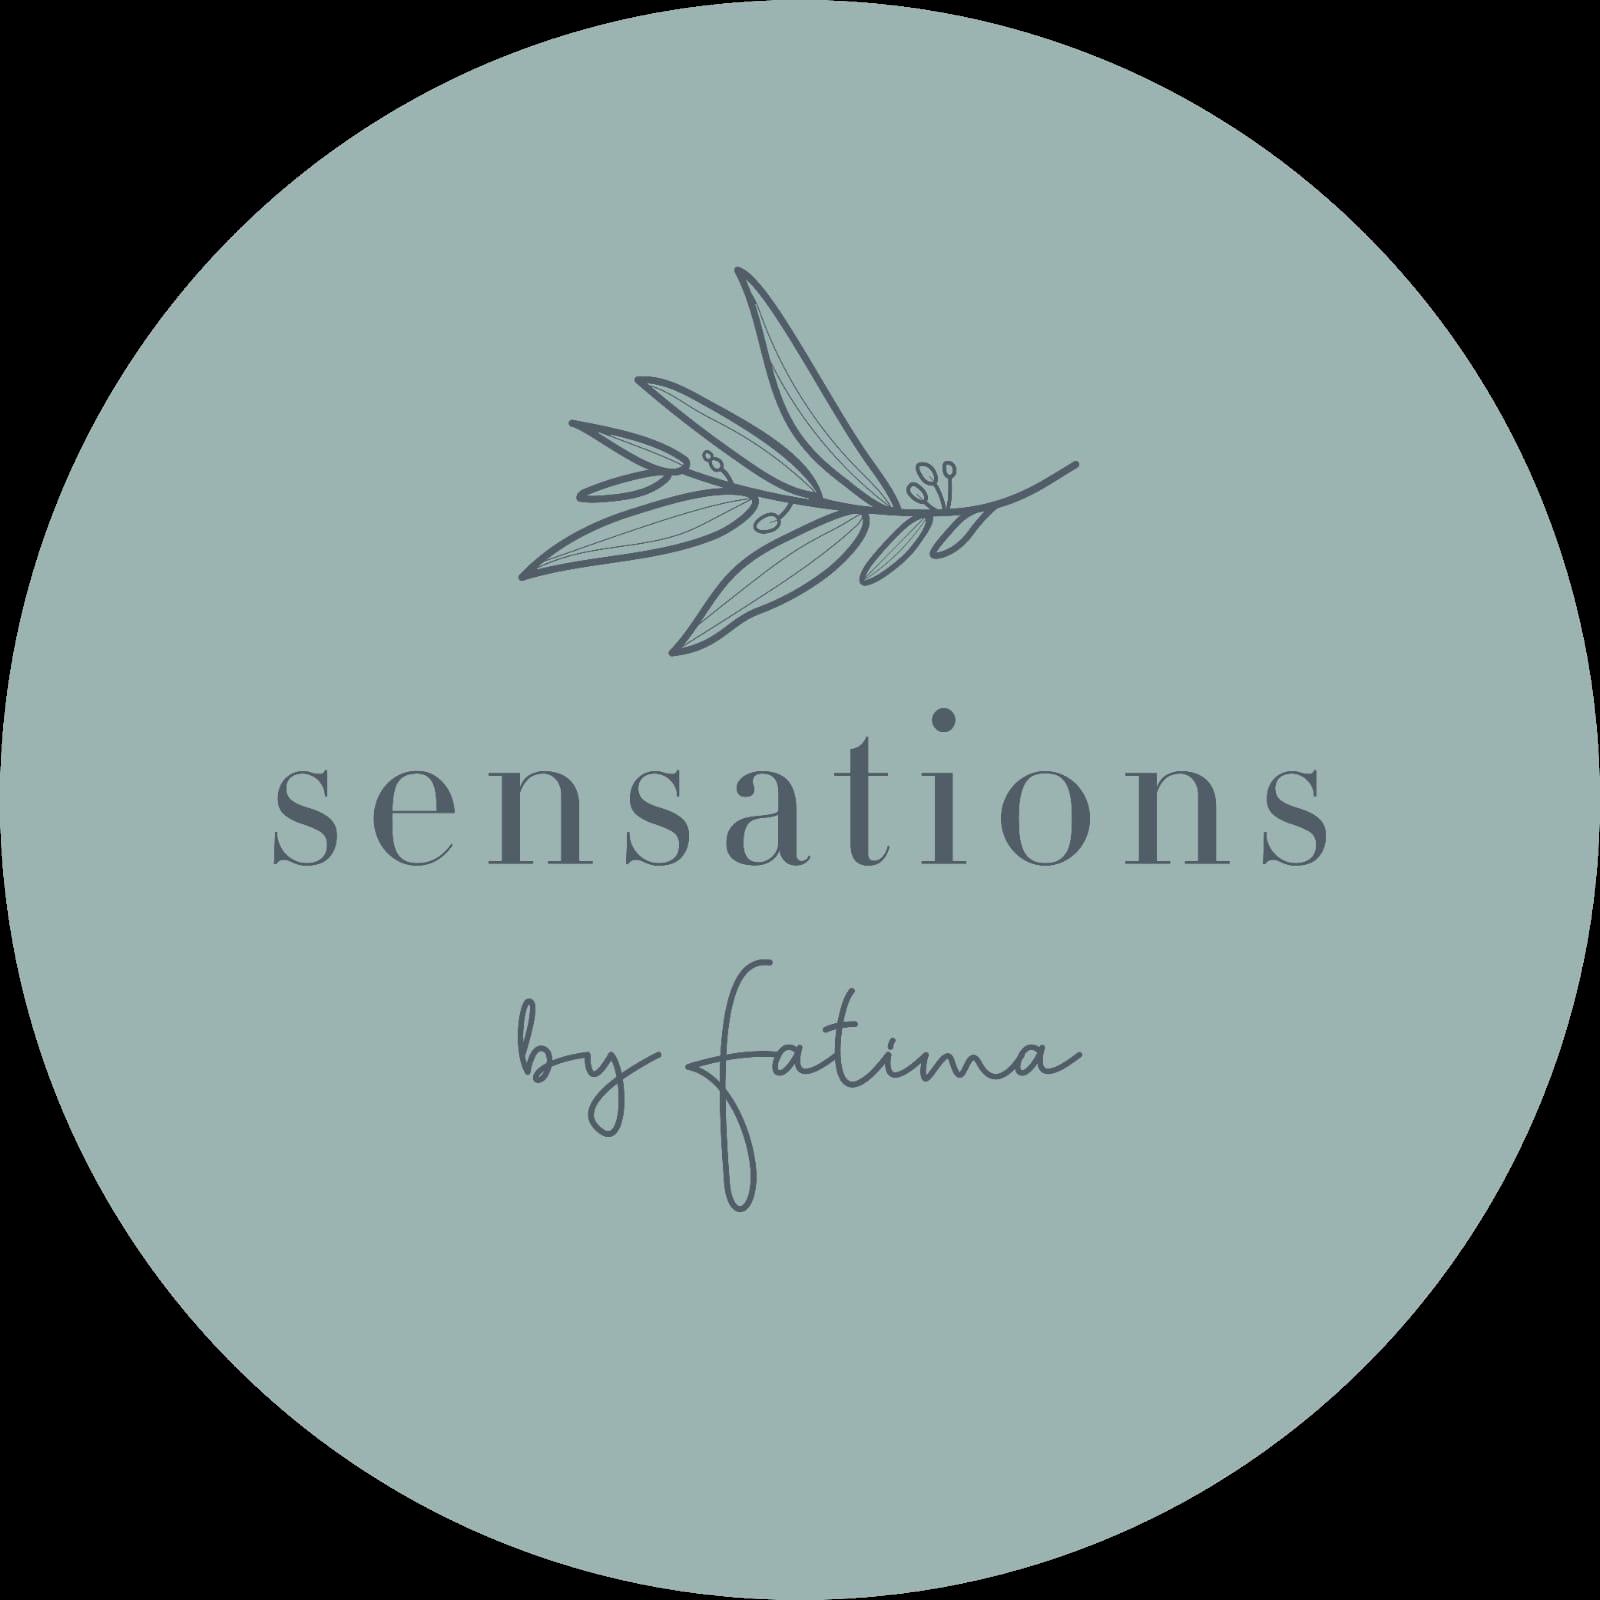 Sensations by FJ